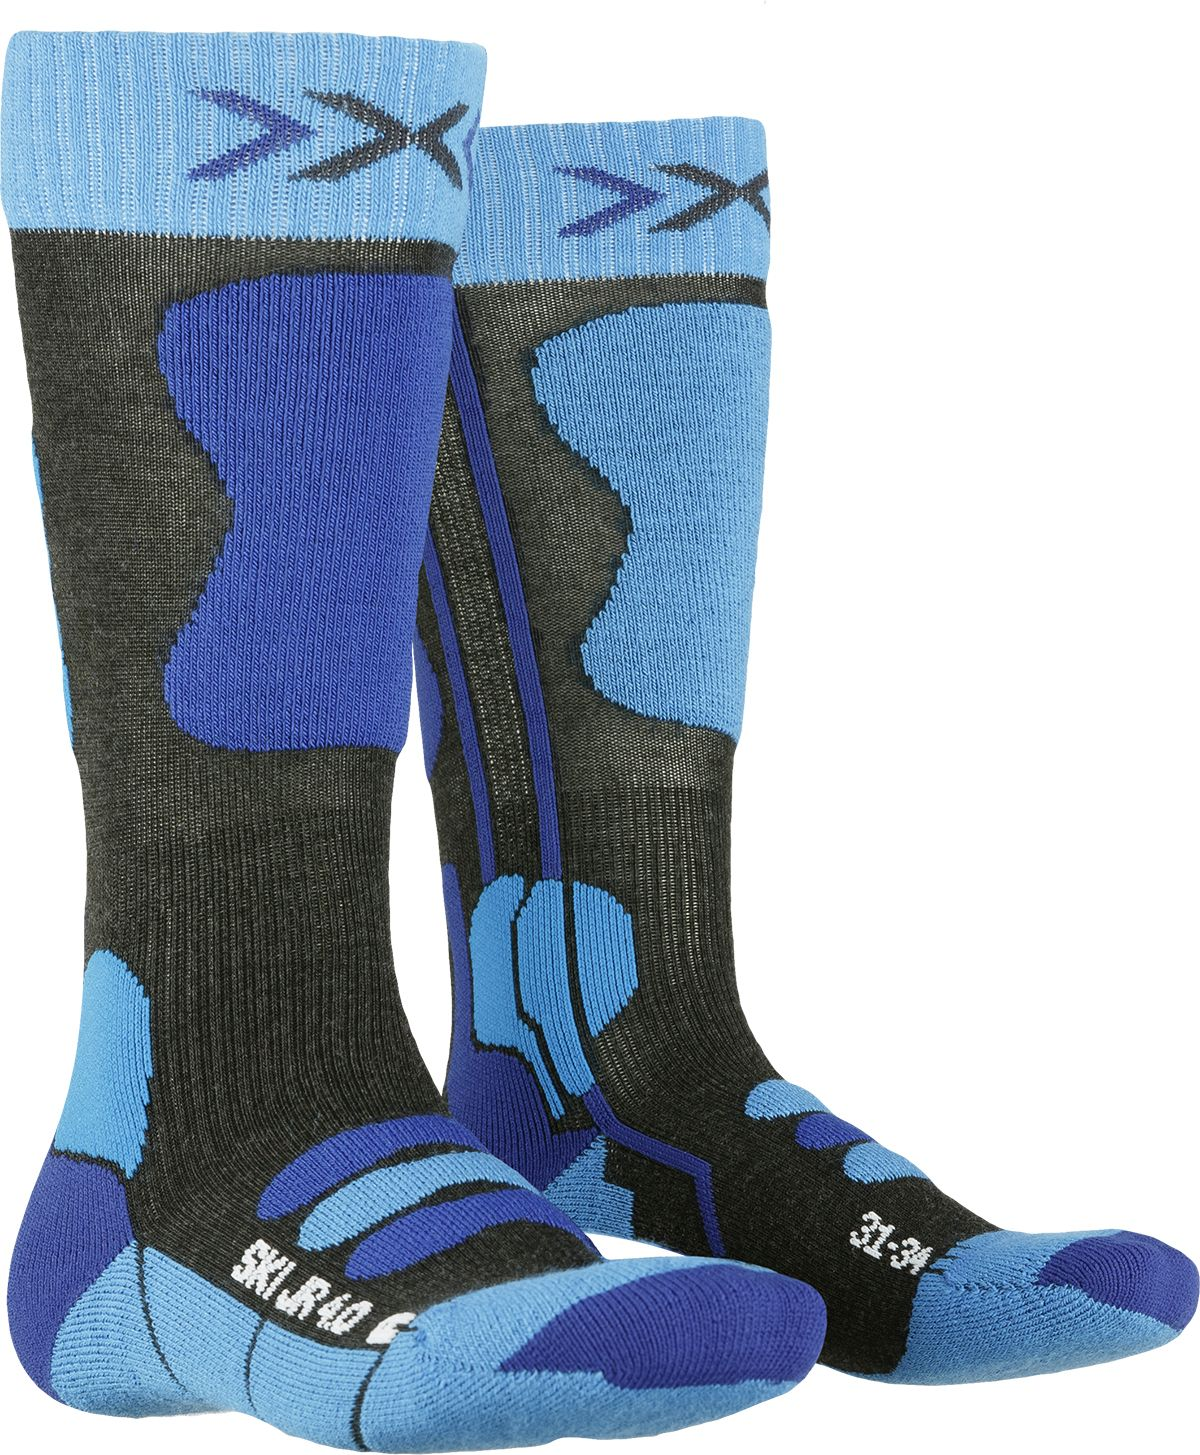 X-Socks Ski Junior 4.0 - anthracite melange/electric blue 31-34